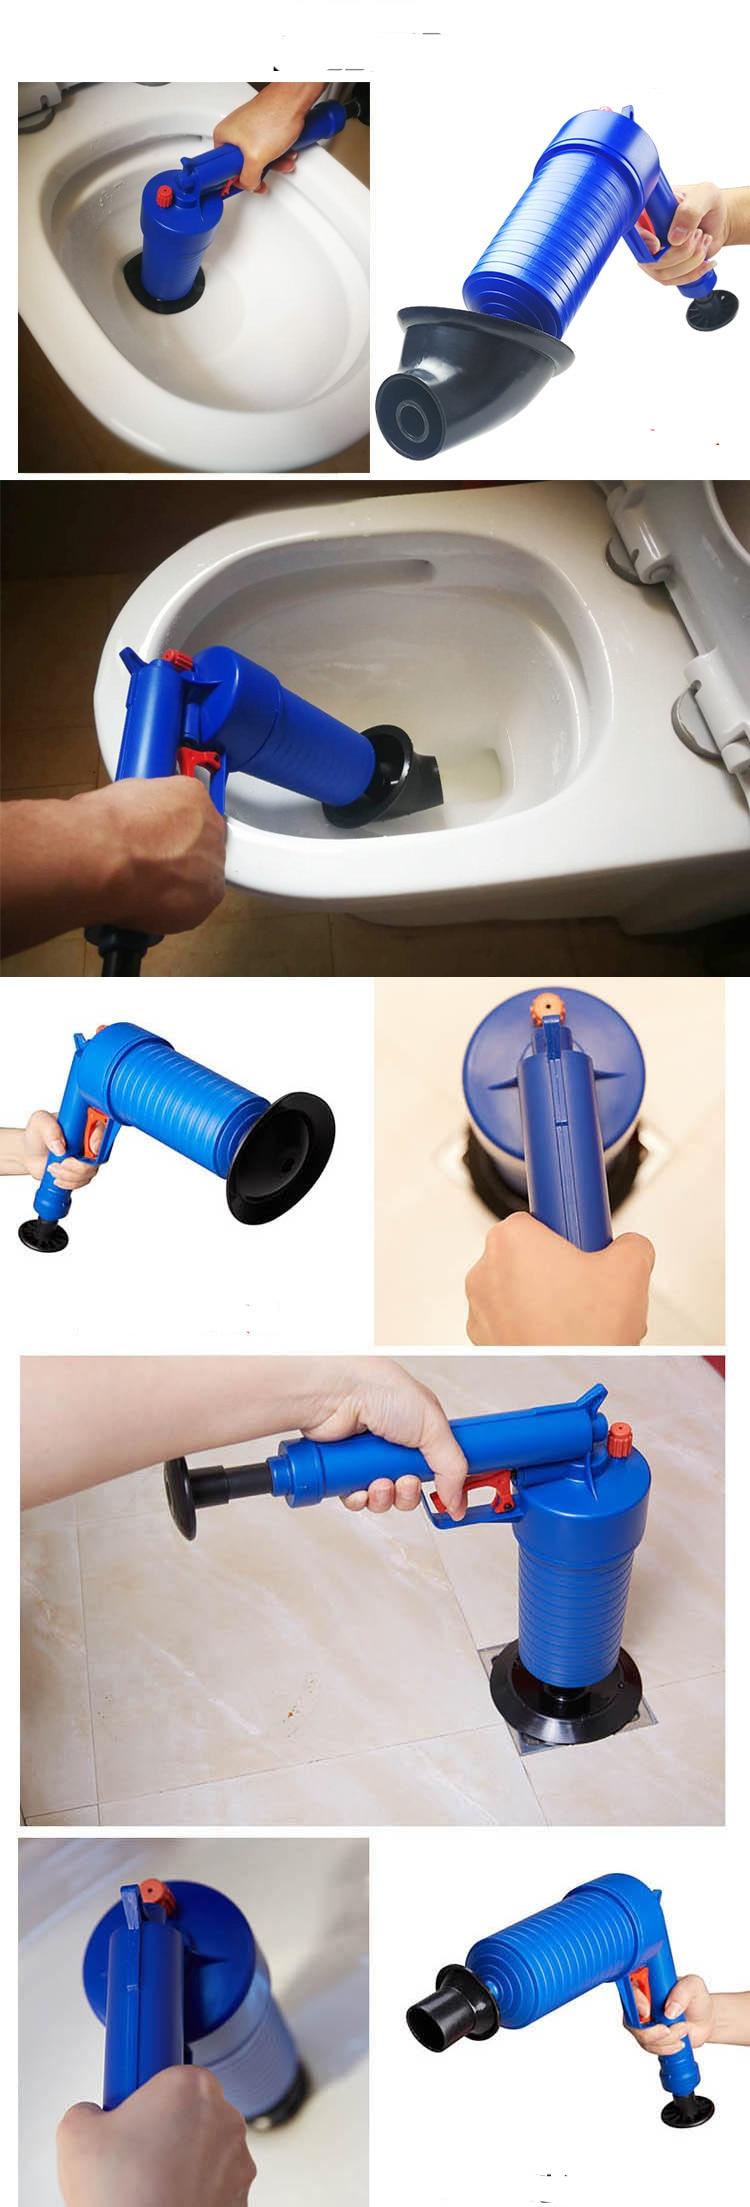 H58d3455e1c814680b2e691b2278f4408w - Bathroom High Pressure Air Drain Blaster Gun Powerful Toilet Sewer Dredge Plunger Auger Cleaner Powerful Plumbing Tools